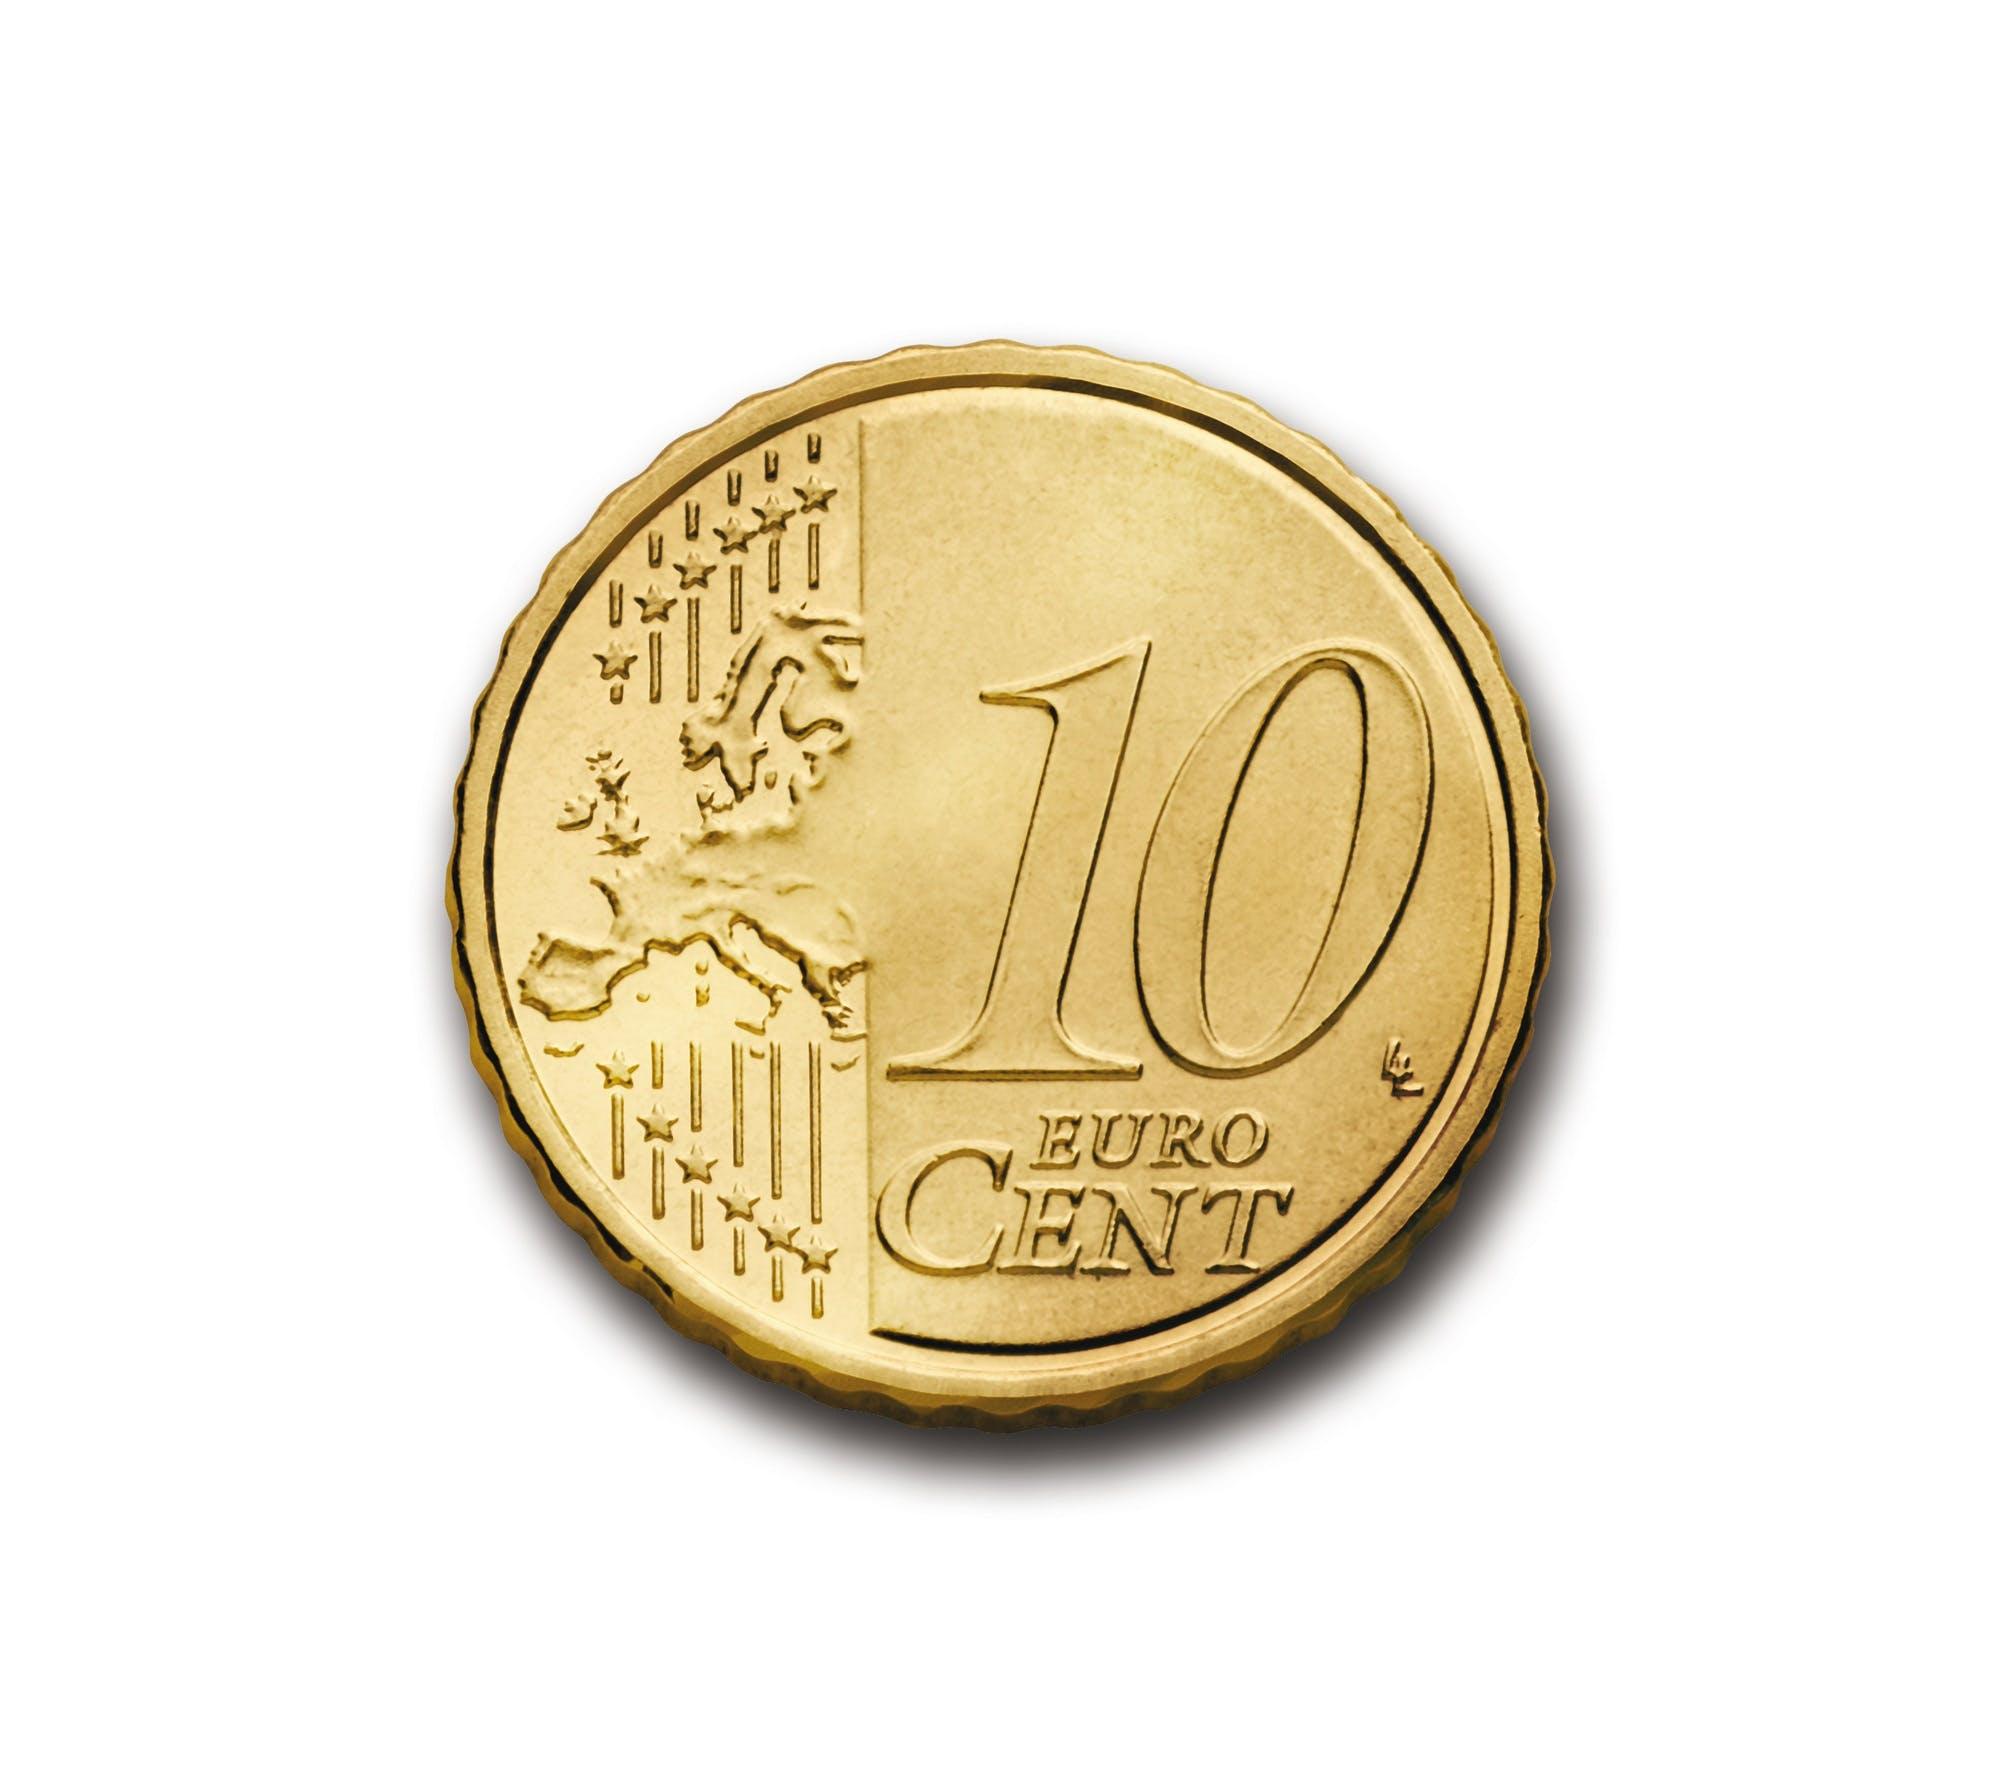 1 U.s. Dollar Bill · Free Stock Photo